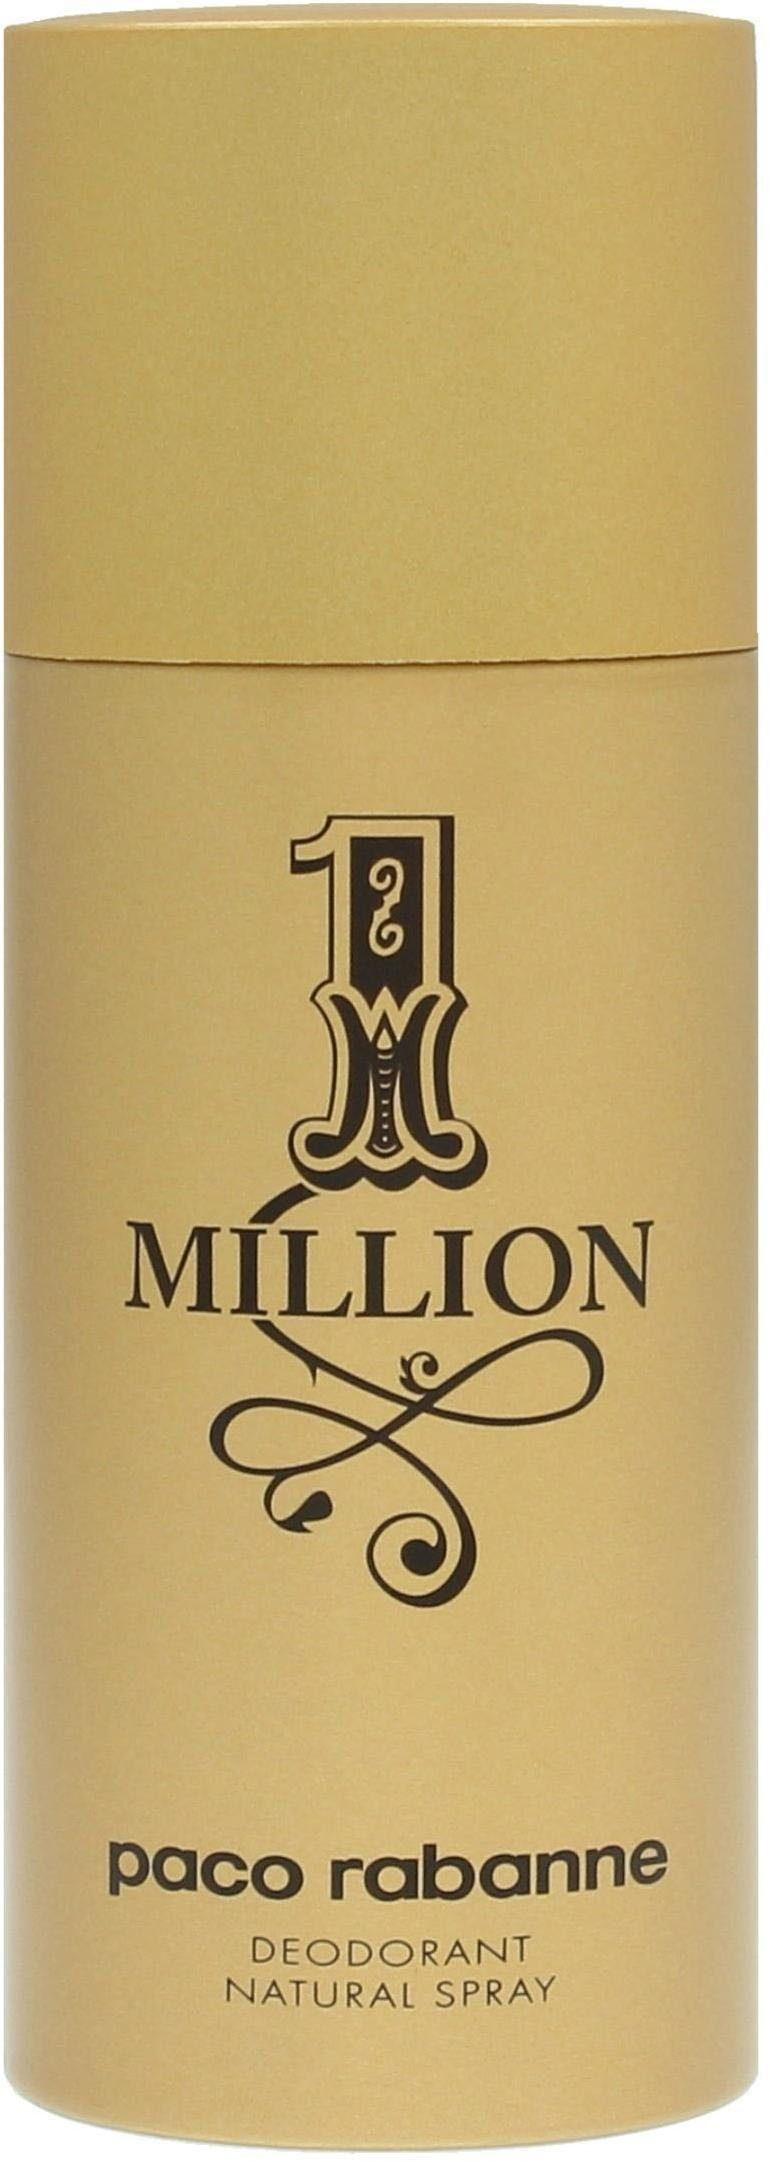 paco rabanne Deo-Spray »1 Million«